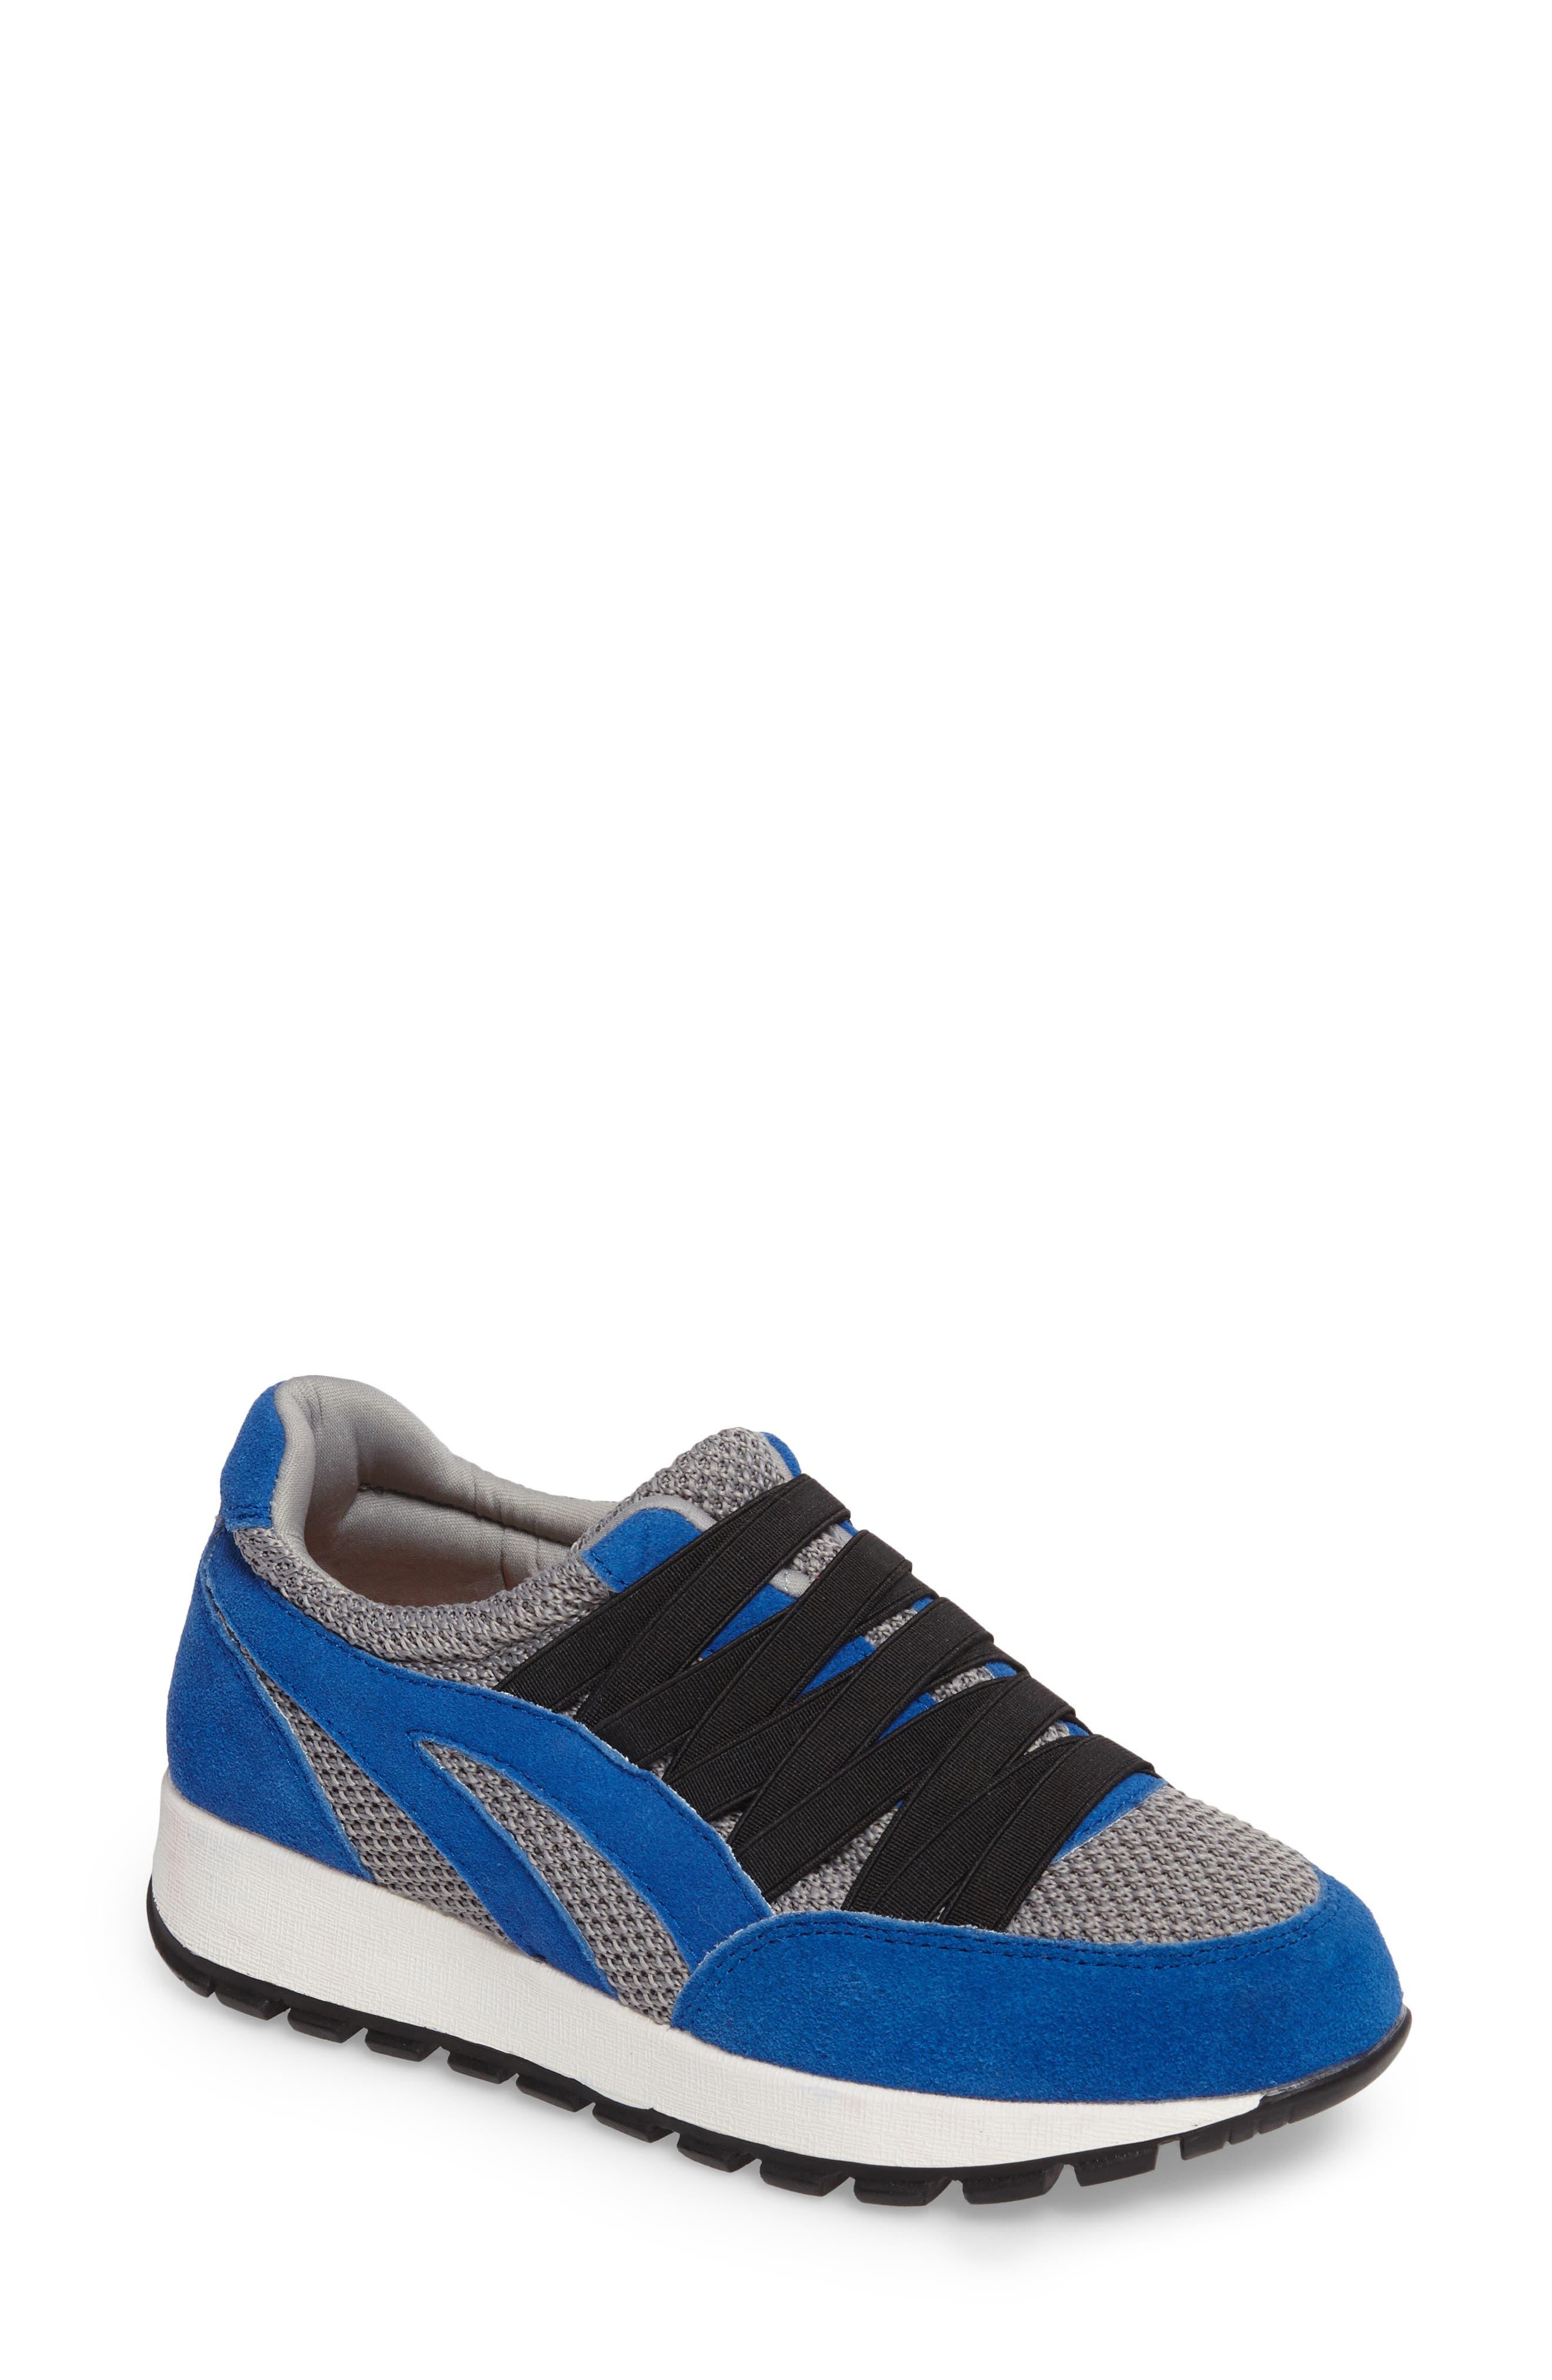 Bernie Mev Tara Cano Sneaker,                         Main,                         color, ROYAL BLUE/ GREY FABRIC